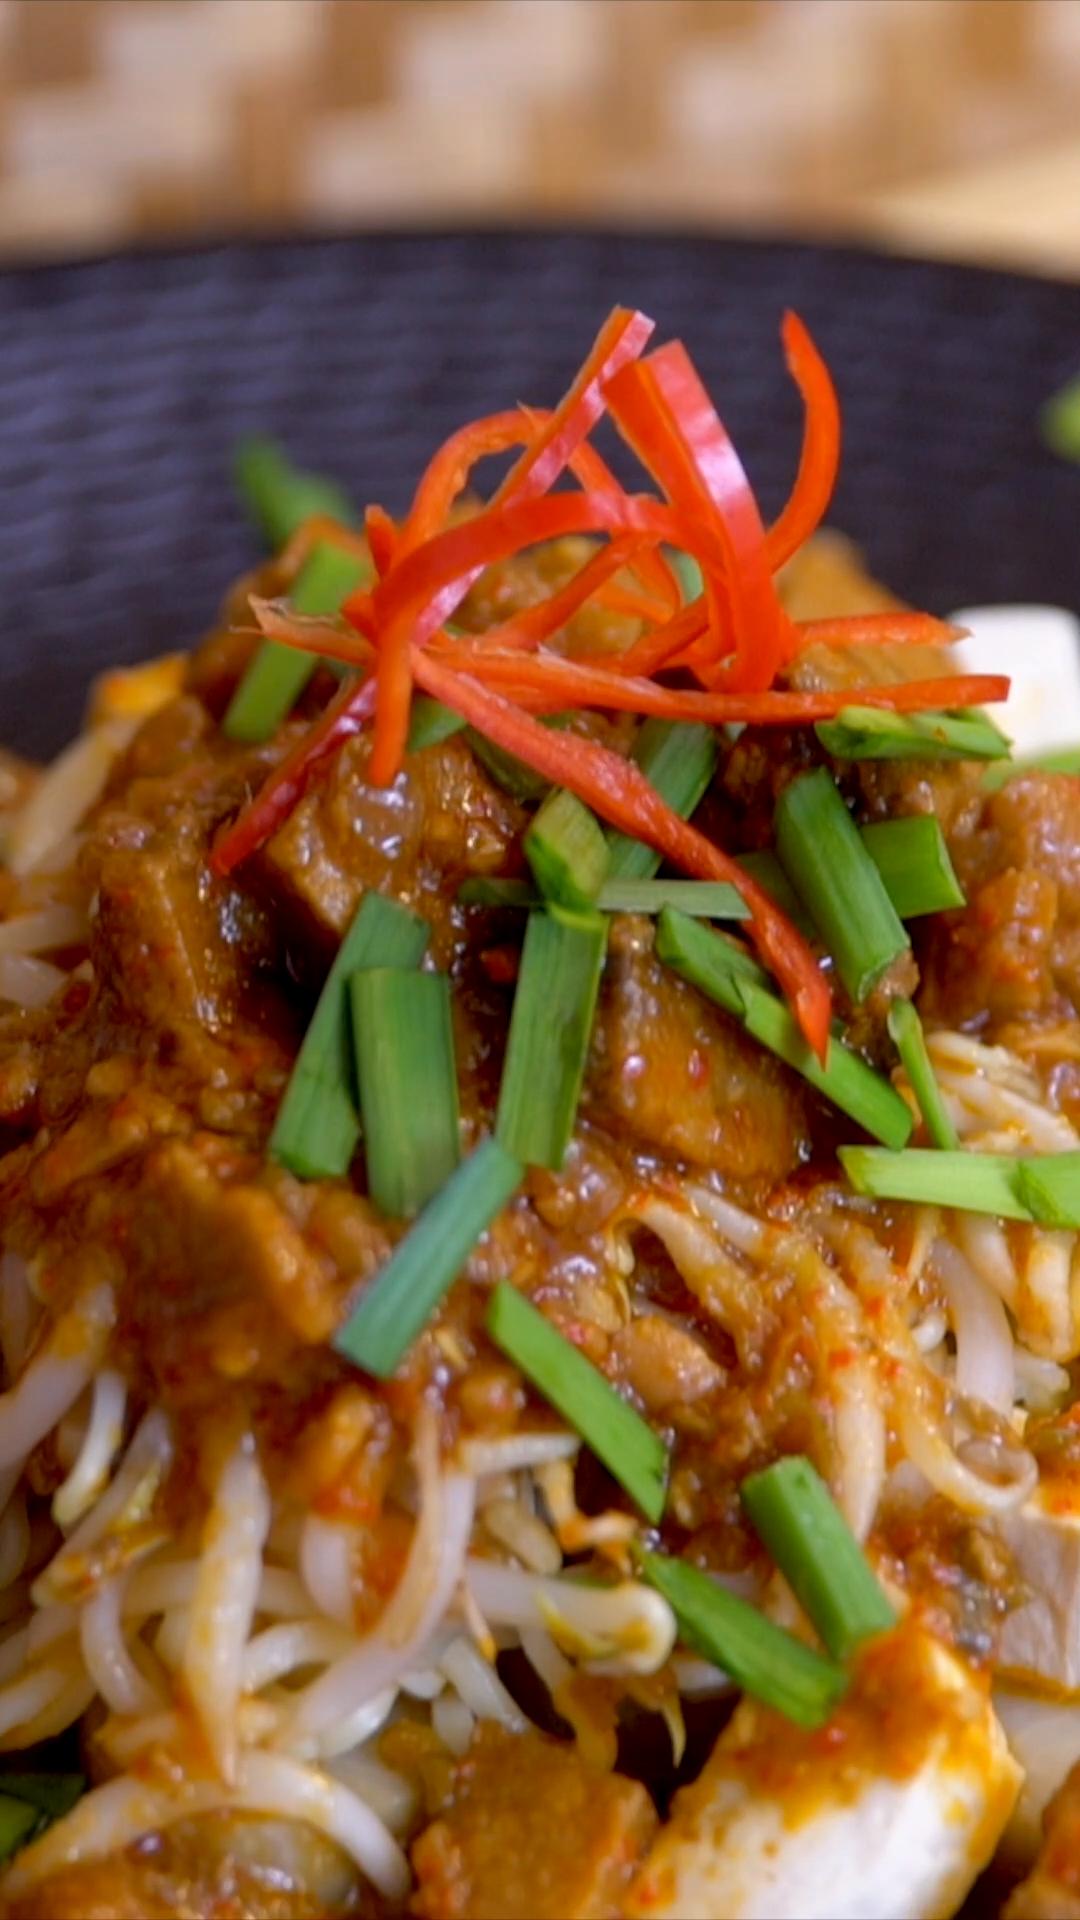 Video Video Tauge Goreng Resep Resep Resep Makanan Resep Masakan Resep Makan Siang Sehat